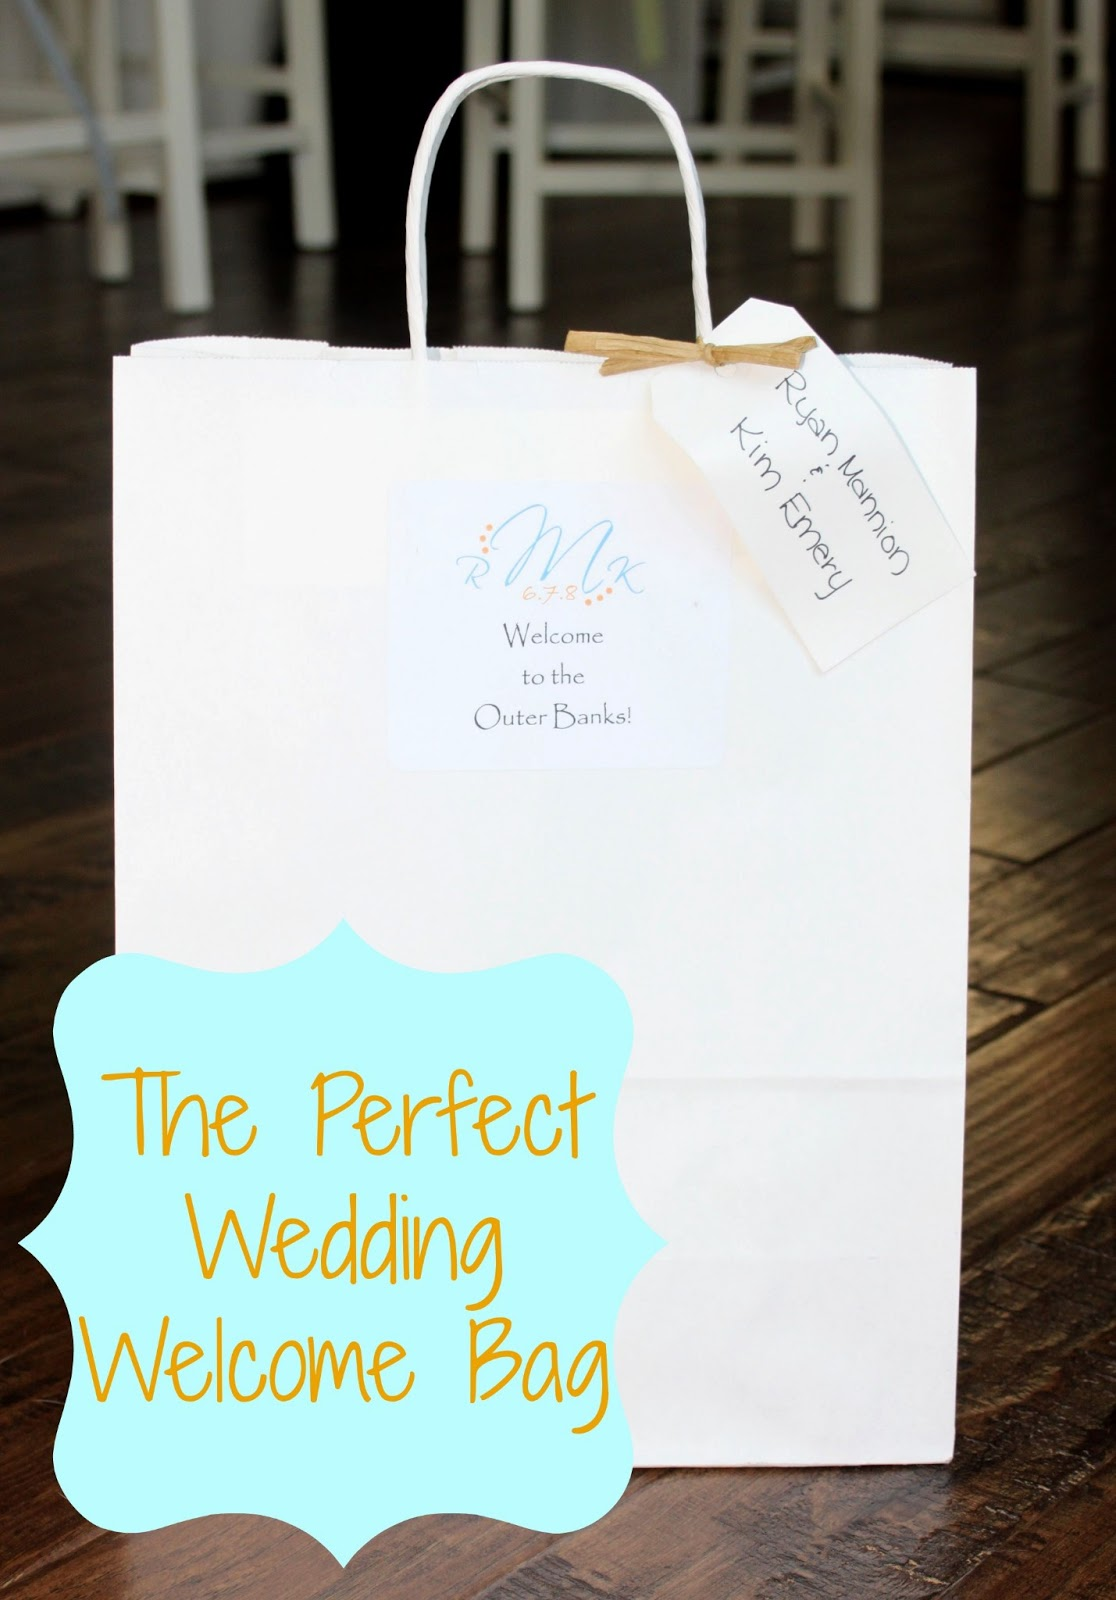 the anatomy of welcome bag wedding welcome bags The Anatomy of Our Welcome Bags